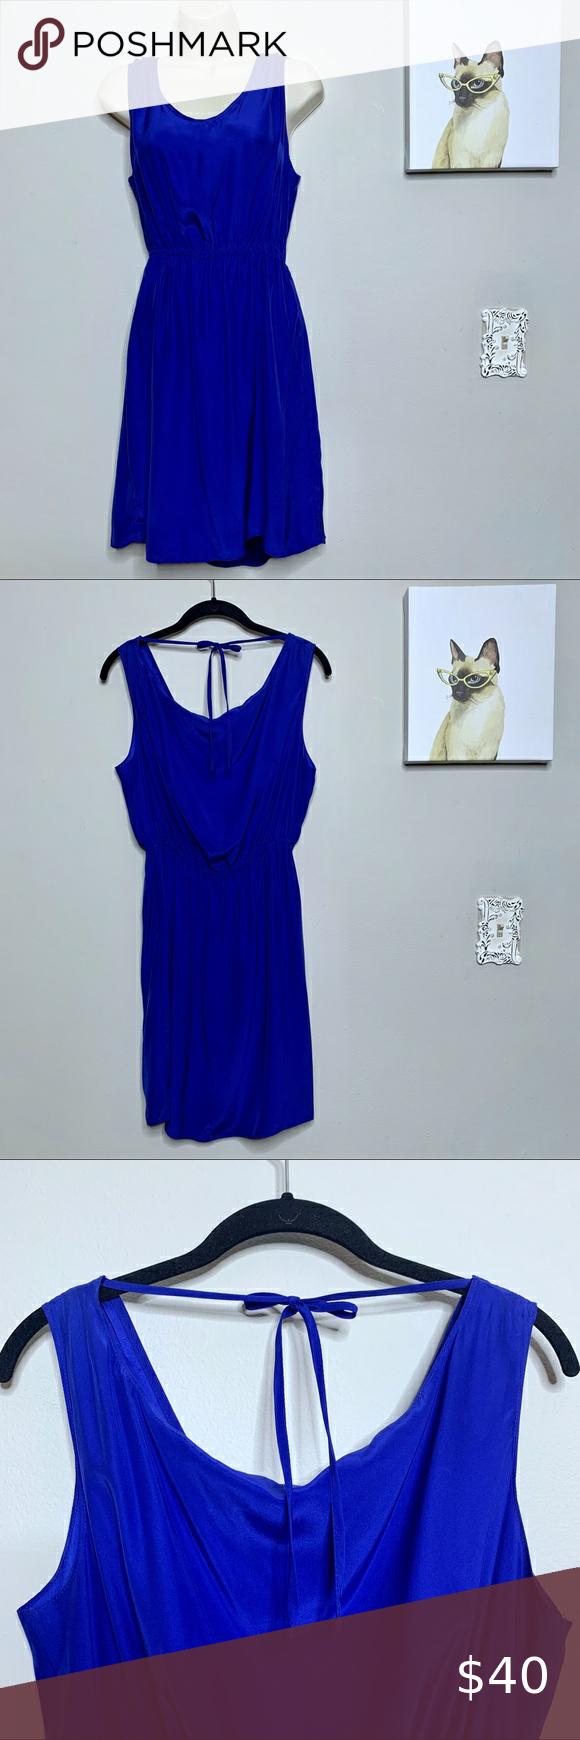 Tye it Up Scoop  Neck Sleeveless Dress with Elastic Waist